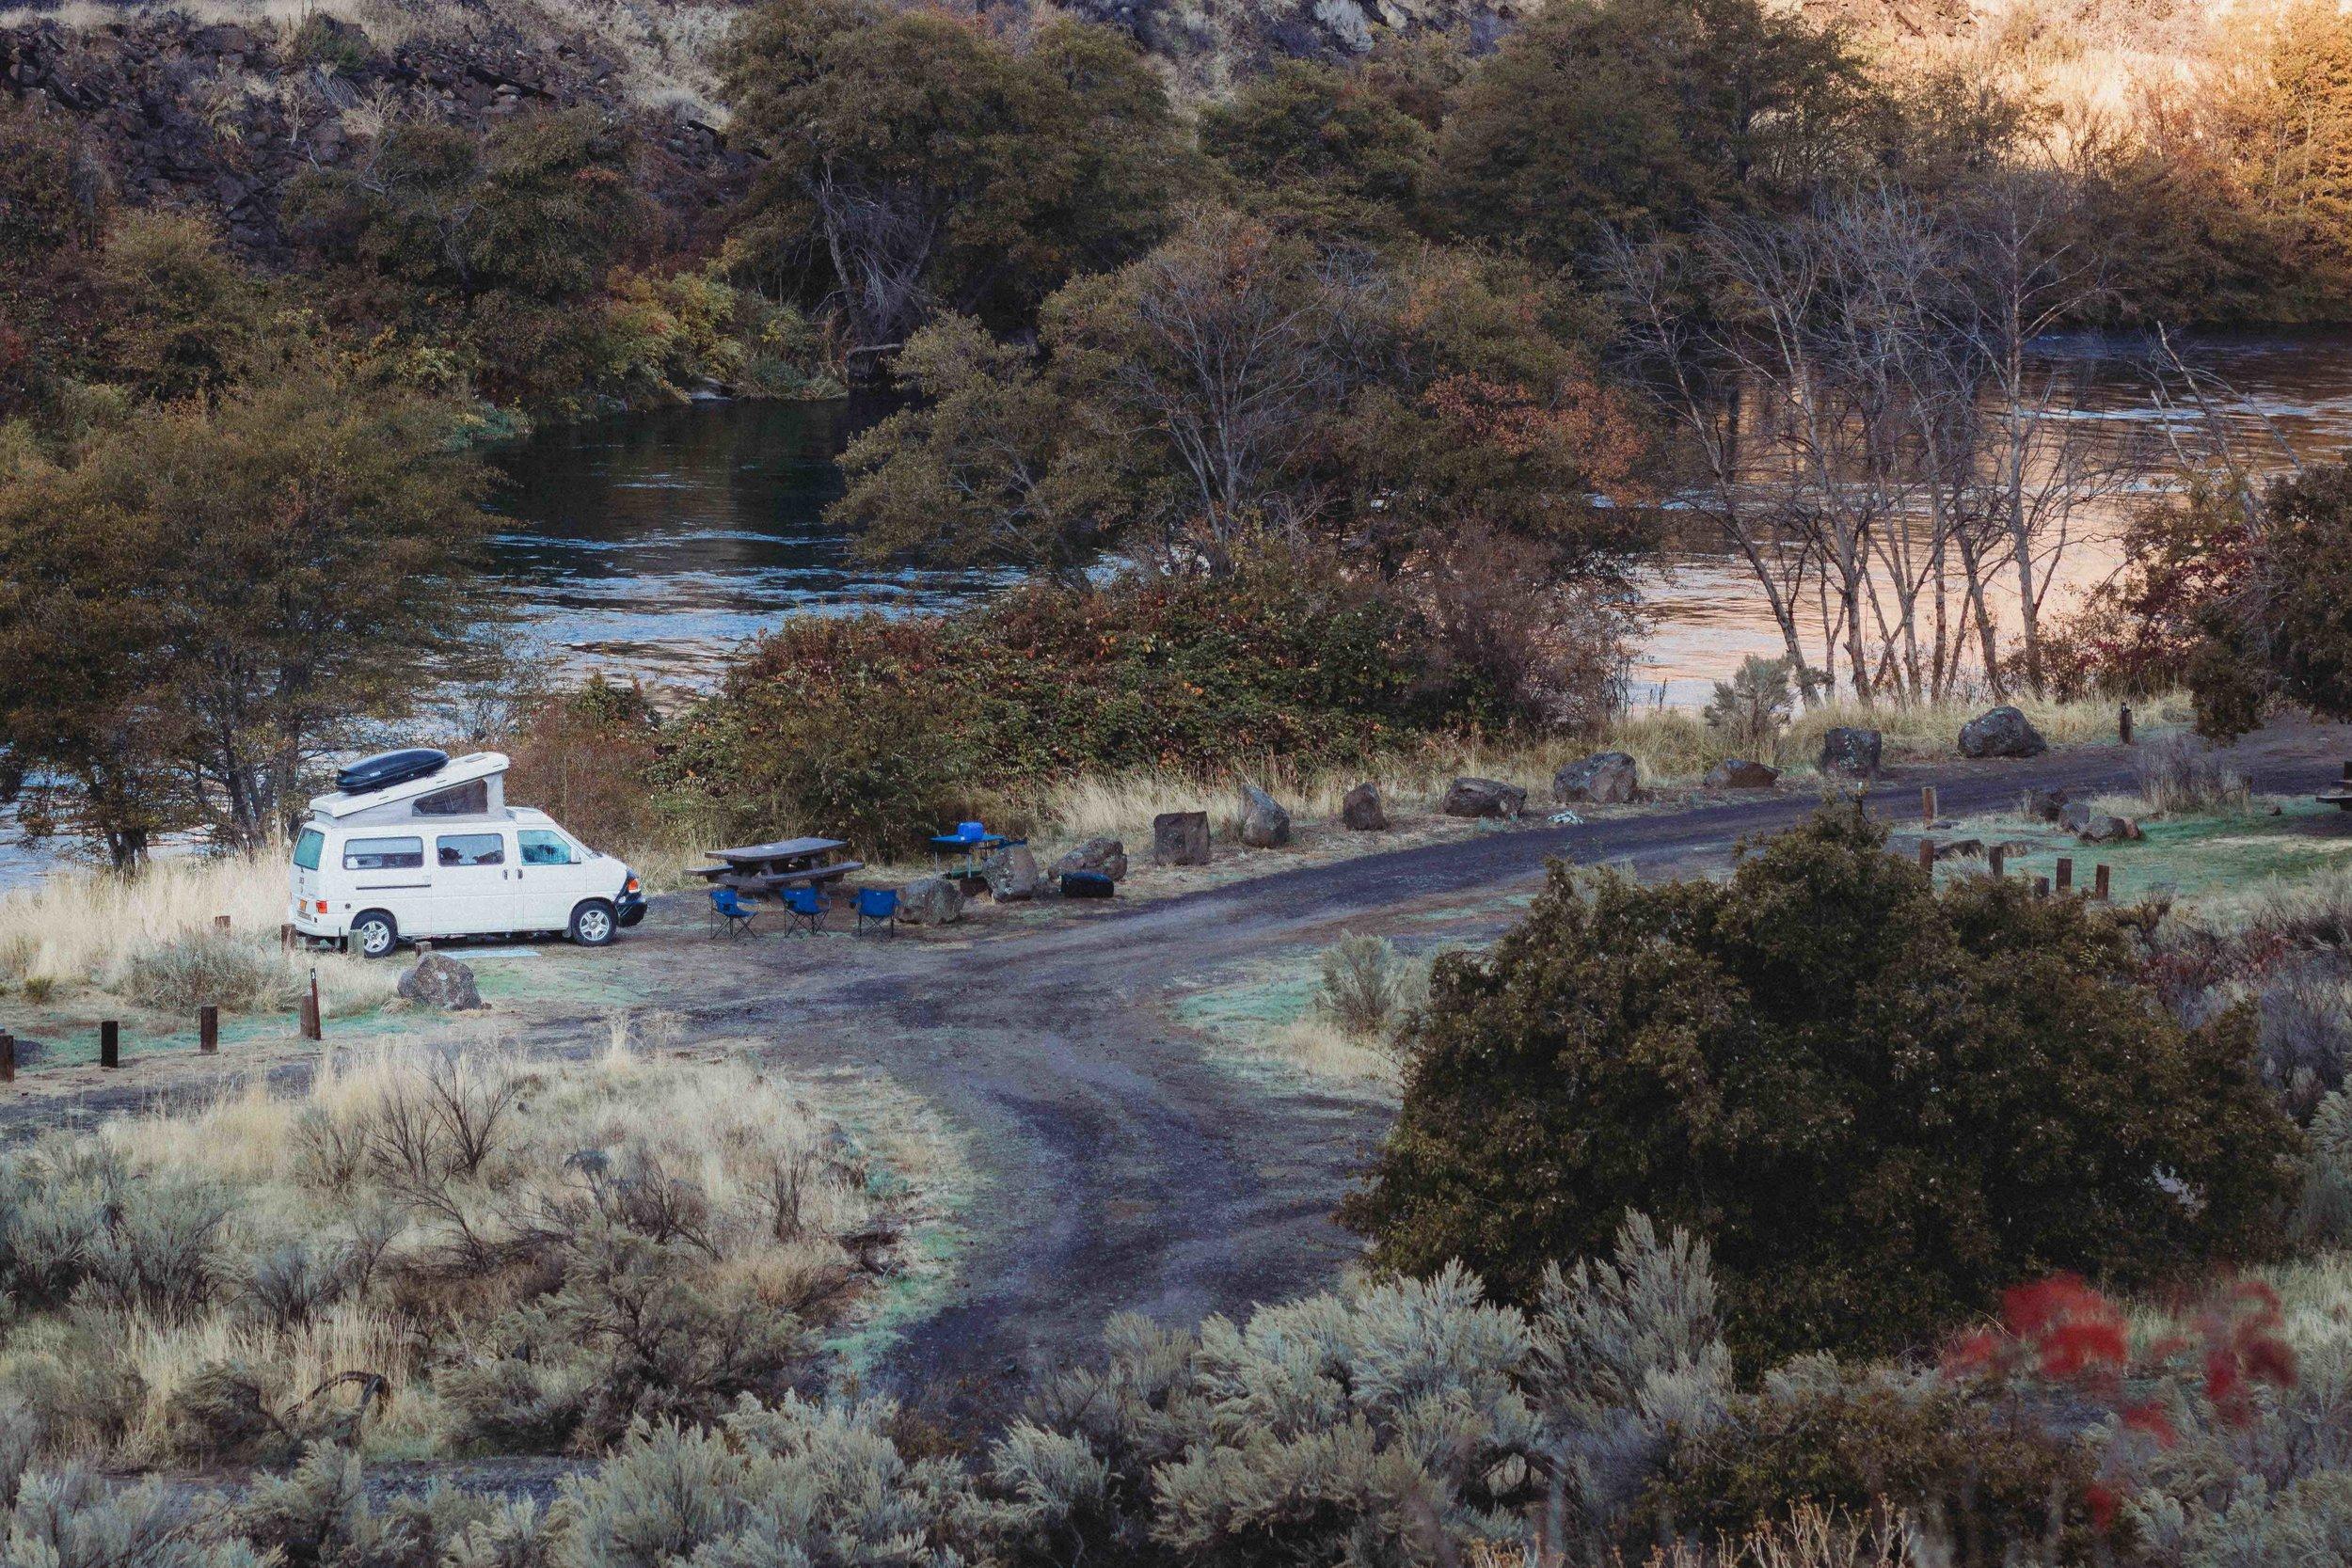 Camping Deschutes River